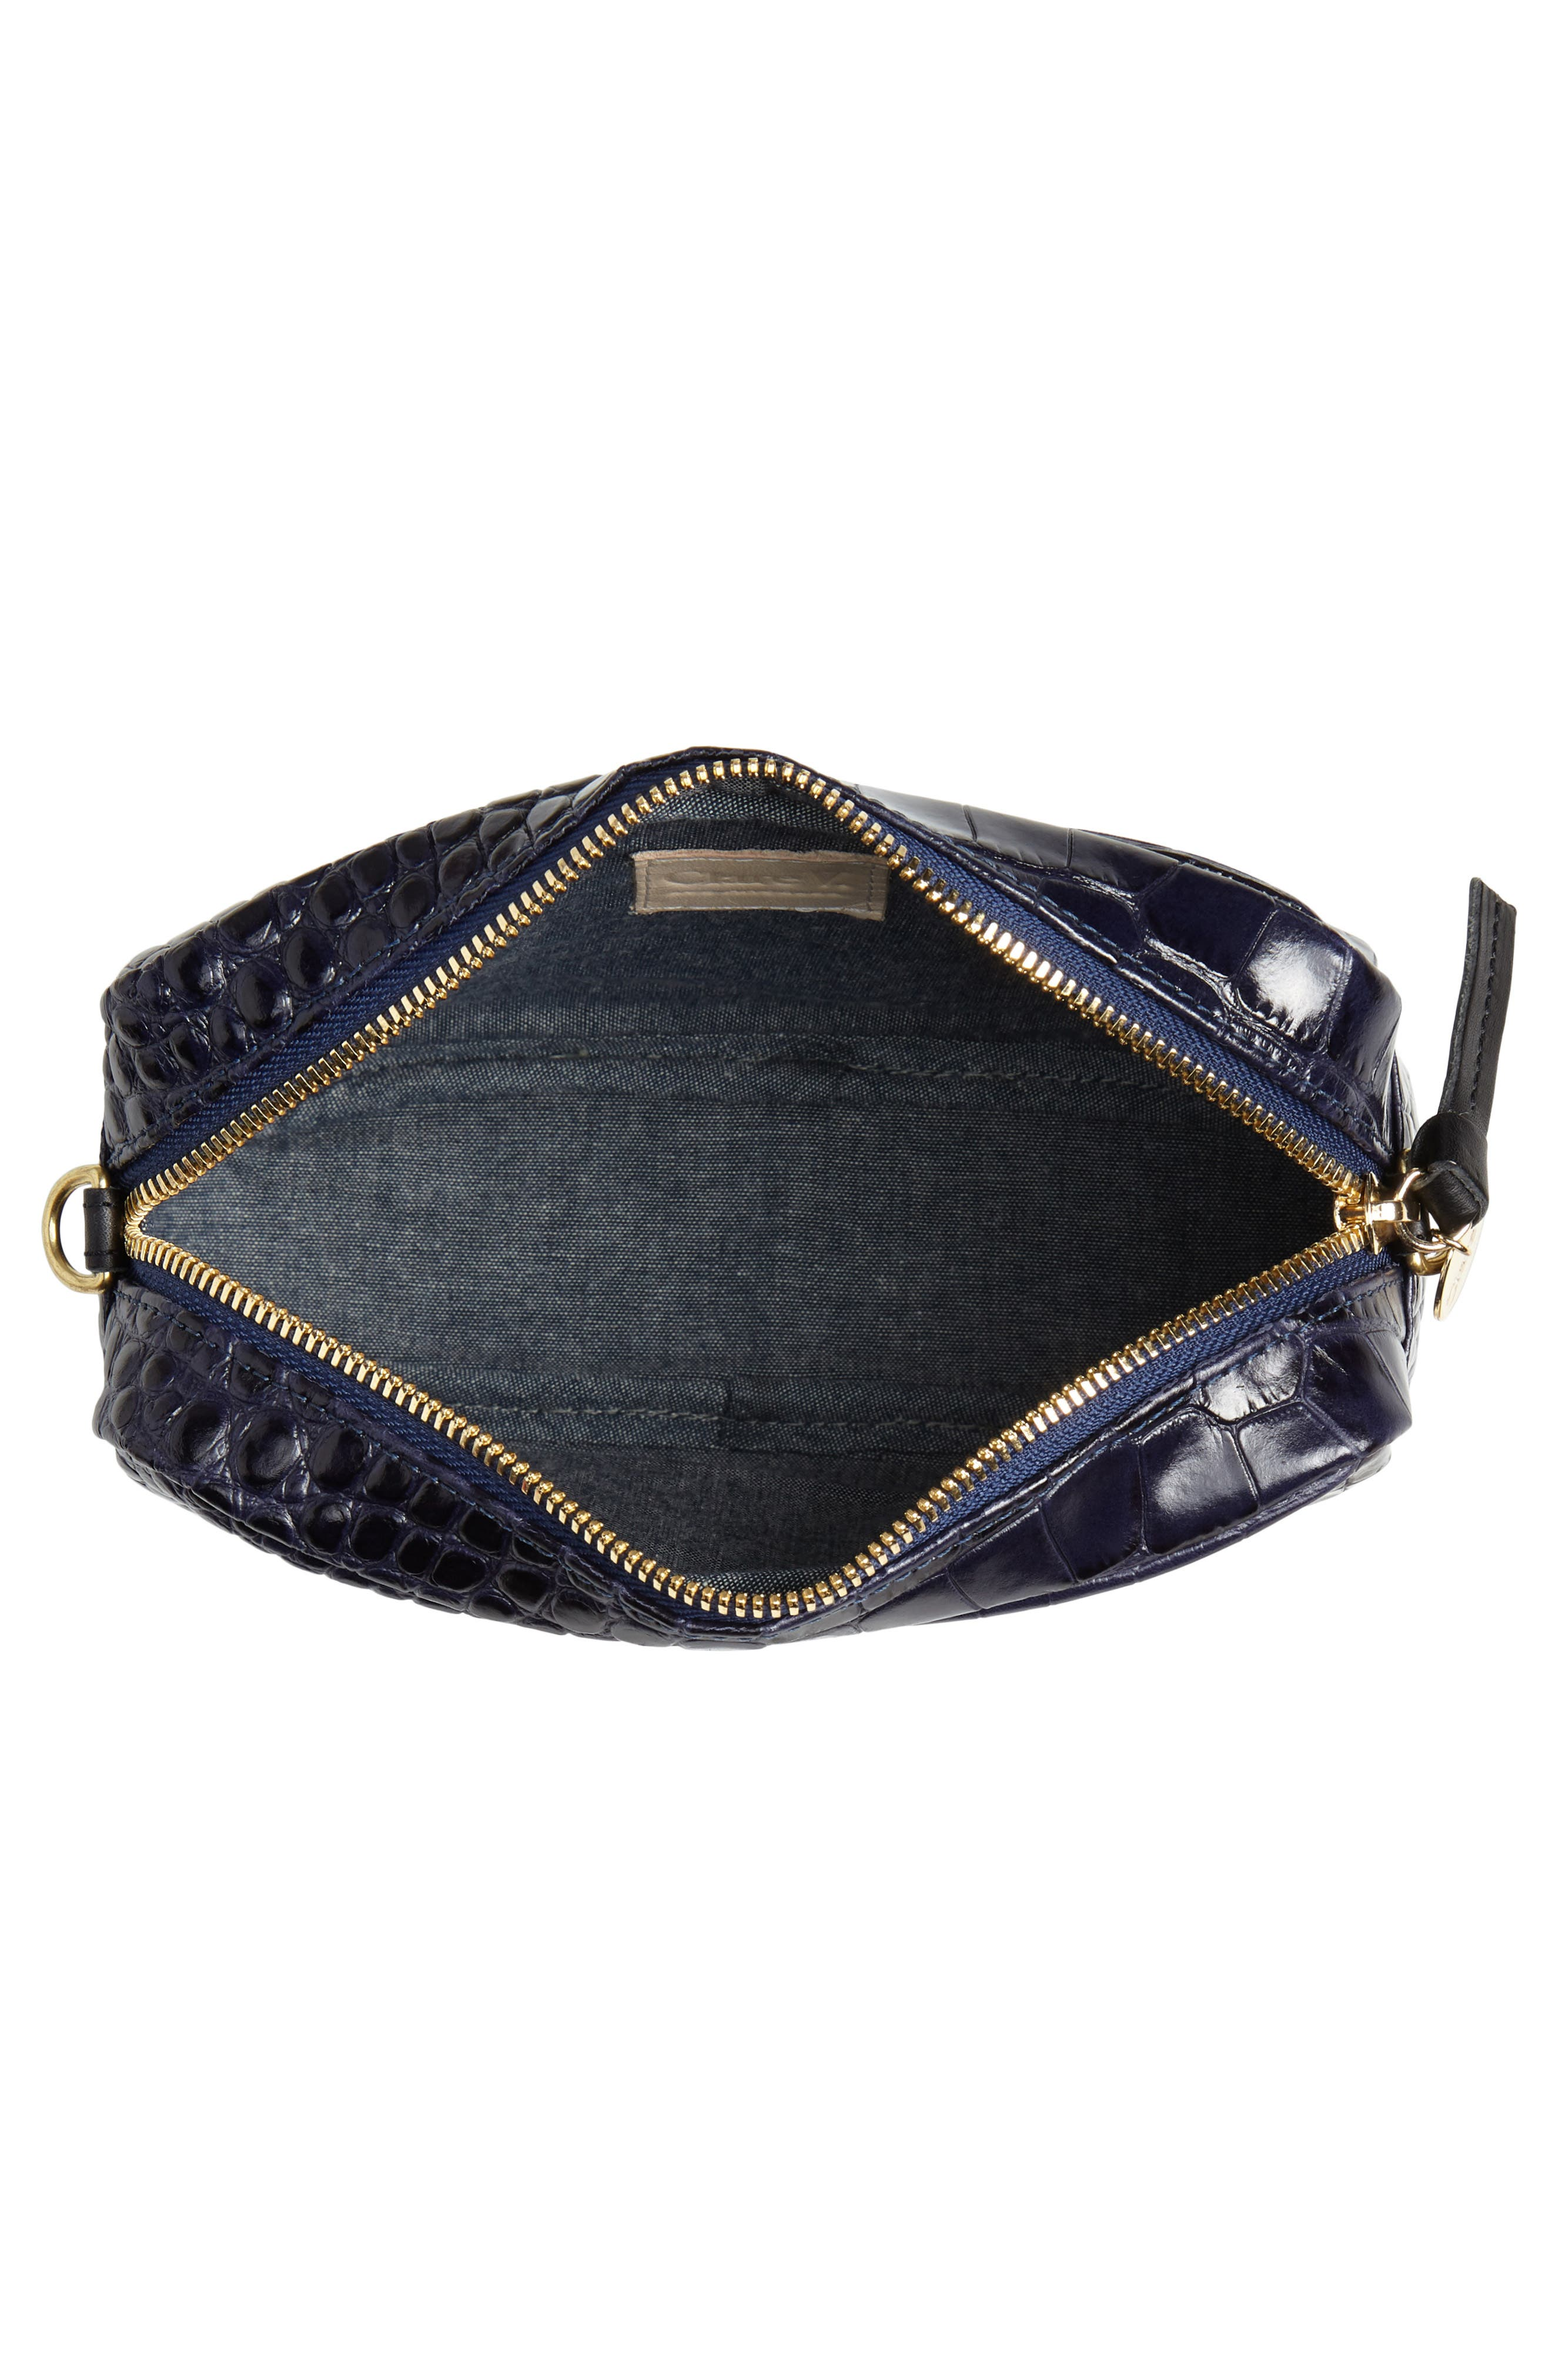 Midi Sac Croc Embossed Leather Crossbody Bag,                             Alternate thumbnail 4, color,                             MIDNIGHT CROCO